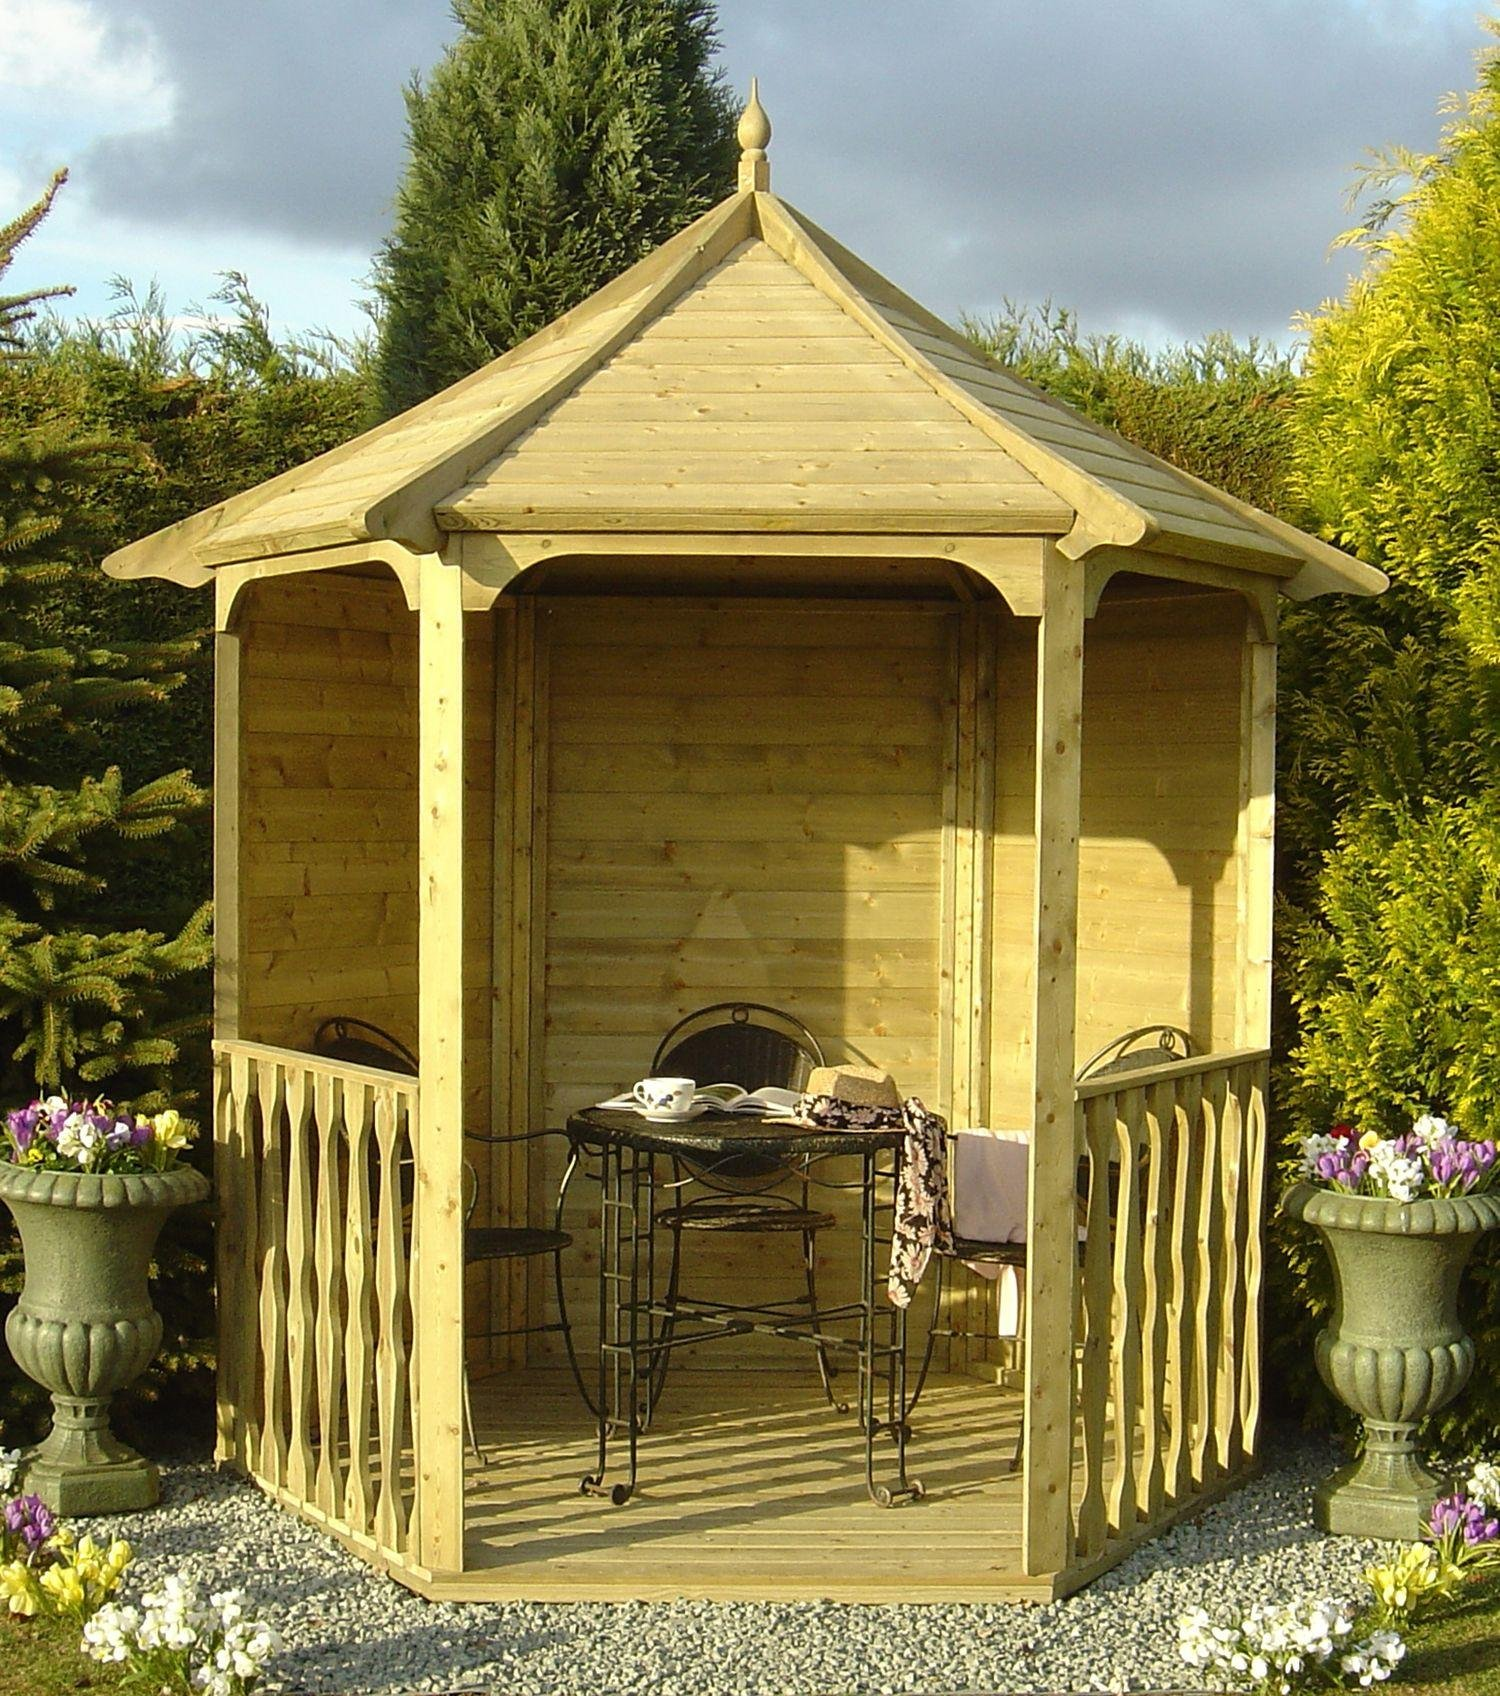 Homewood Pressure Treated Hexagonal Arbour 6 x 7ft. lowest price